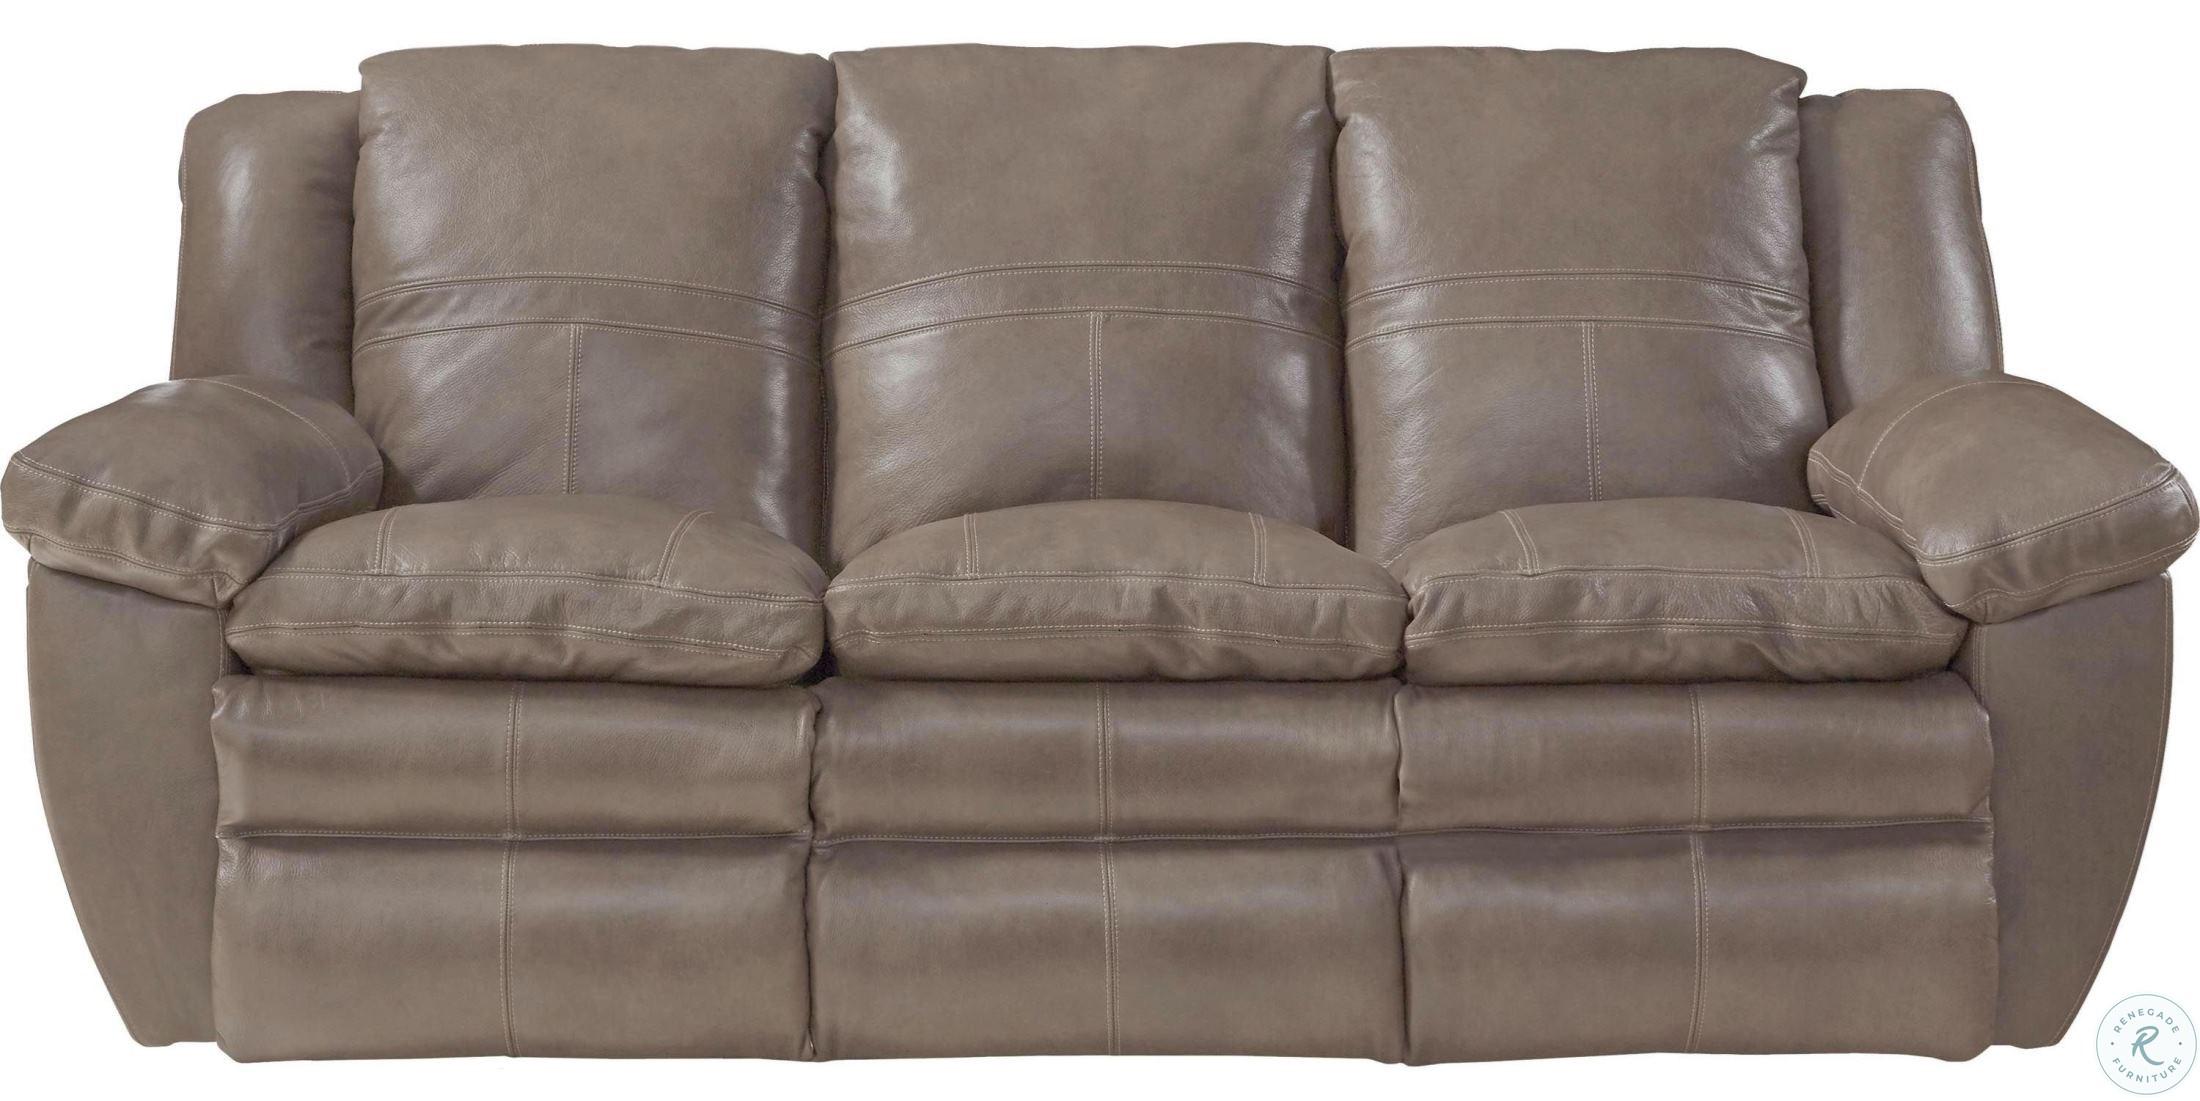 Aria Smoke Lay Flat Reclining Sofa from Catnapper | Coleman Furniture